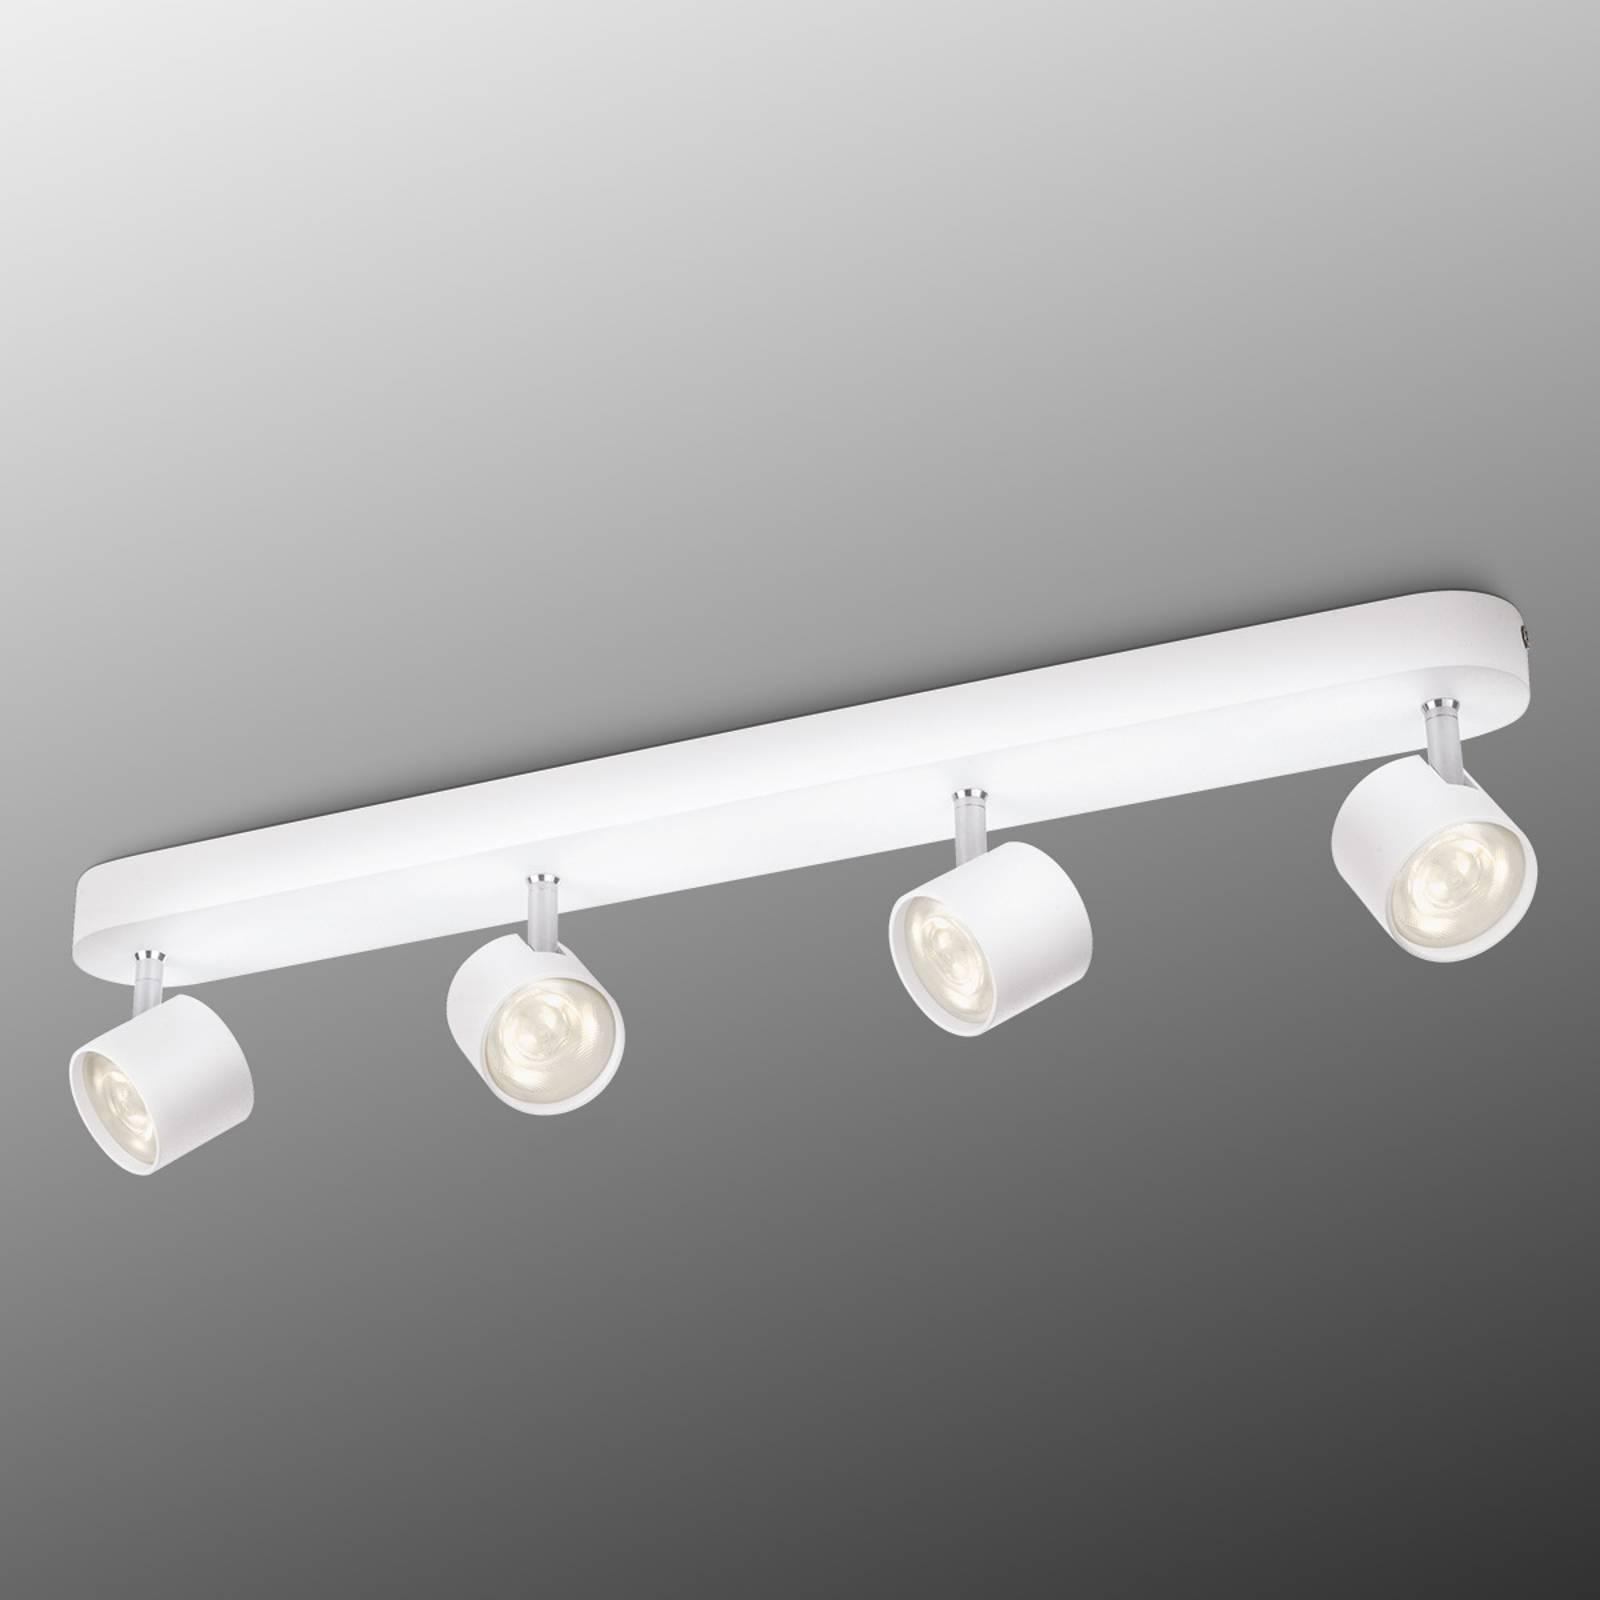 LED-plafondlamp Star, 4-lichts